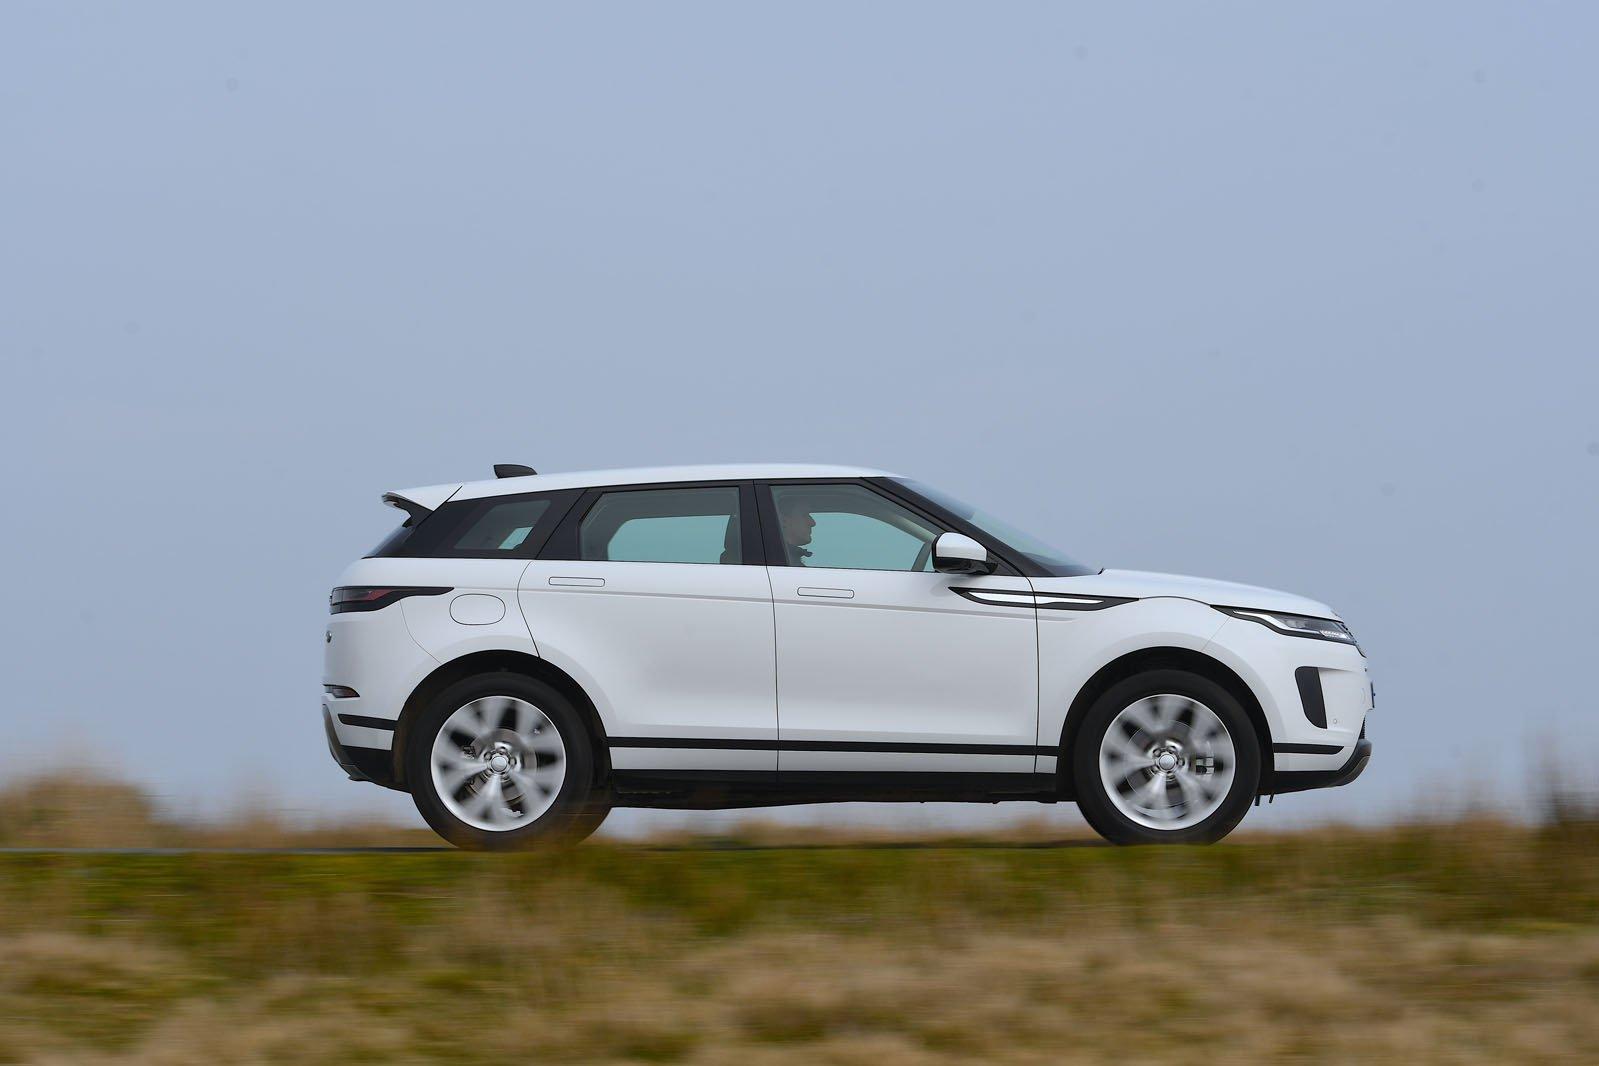 Range Rover Evoque driving